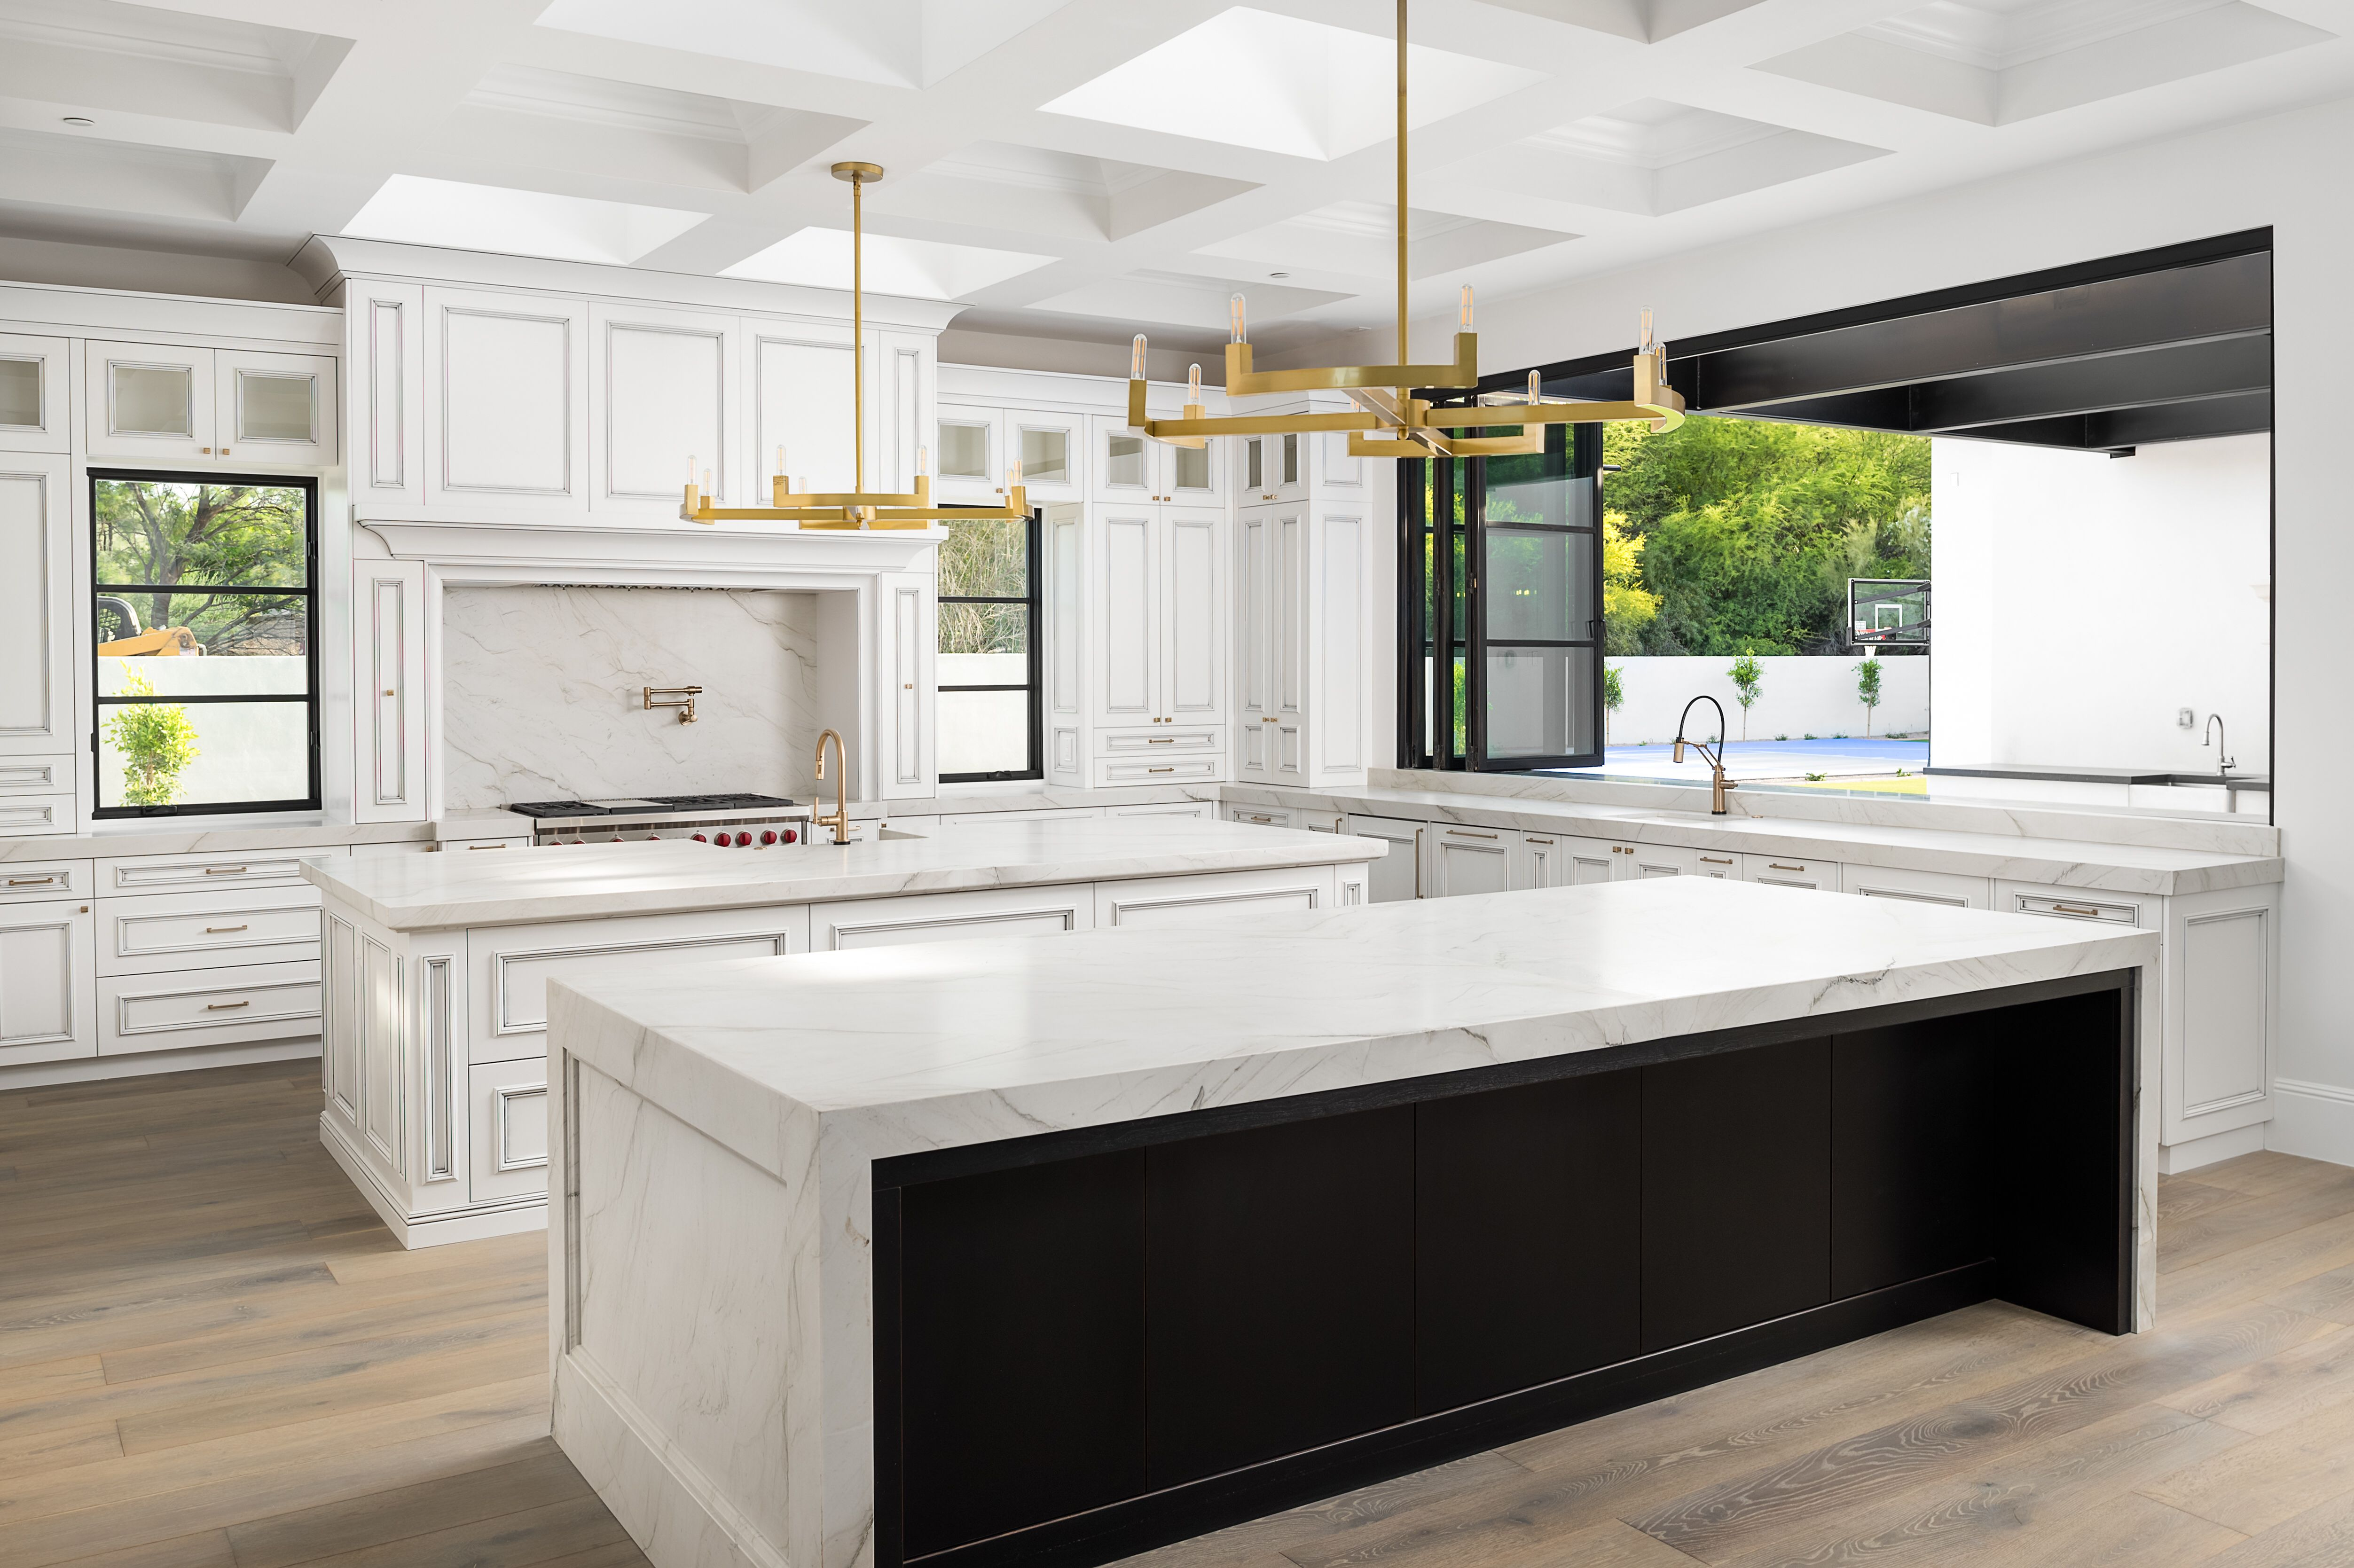 Arizona S Premier Luxury Custom Home Builder Custom Homes Luxury Homes Dream Houses Home Builders